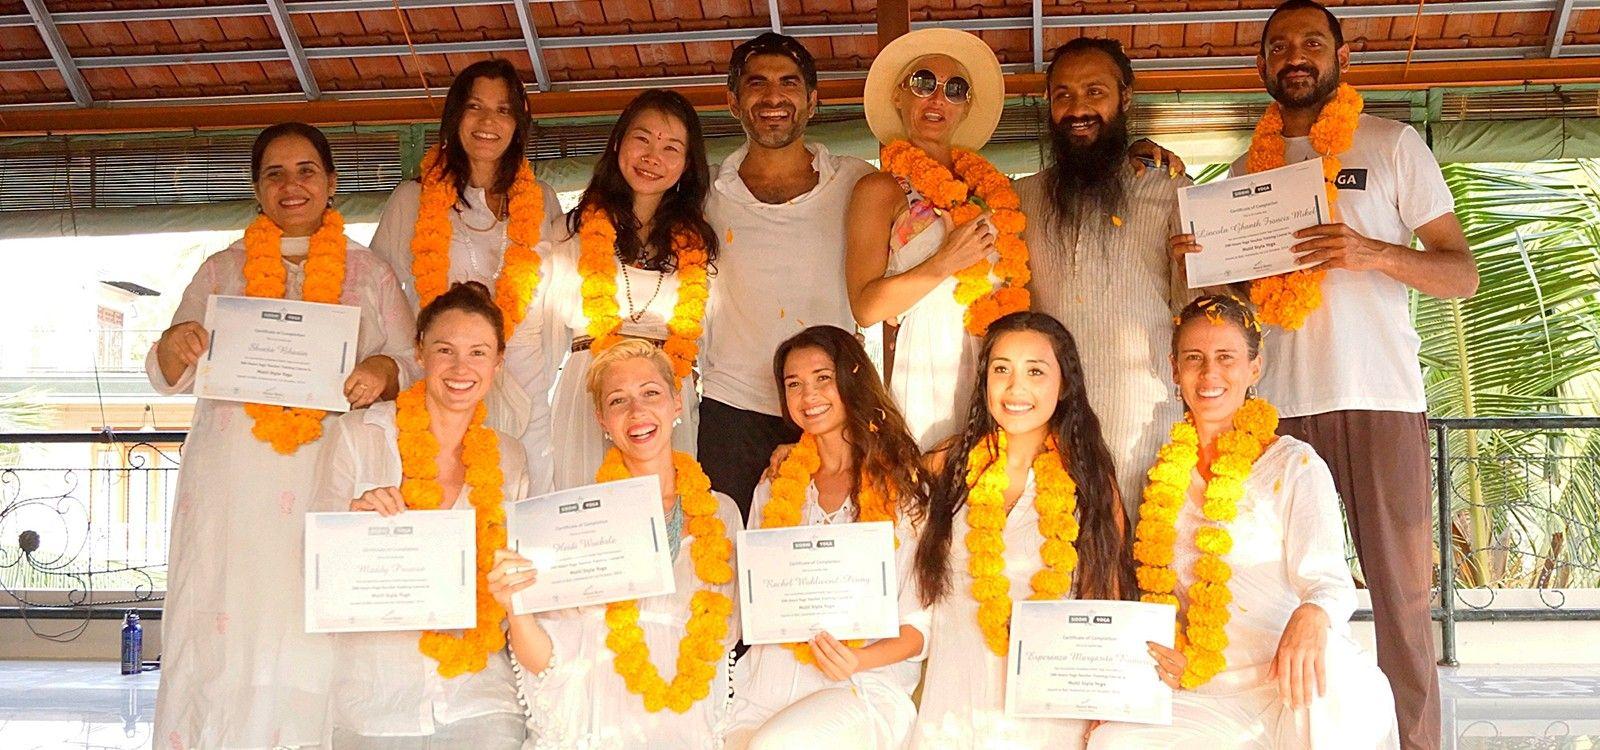 siddhi yoga teacher training certification bali